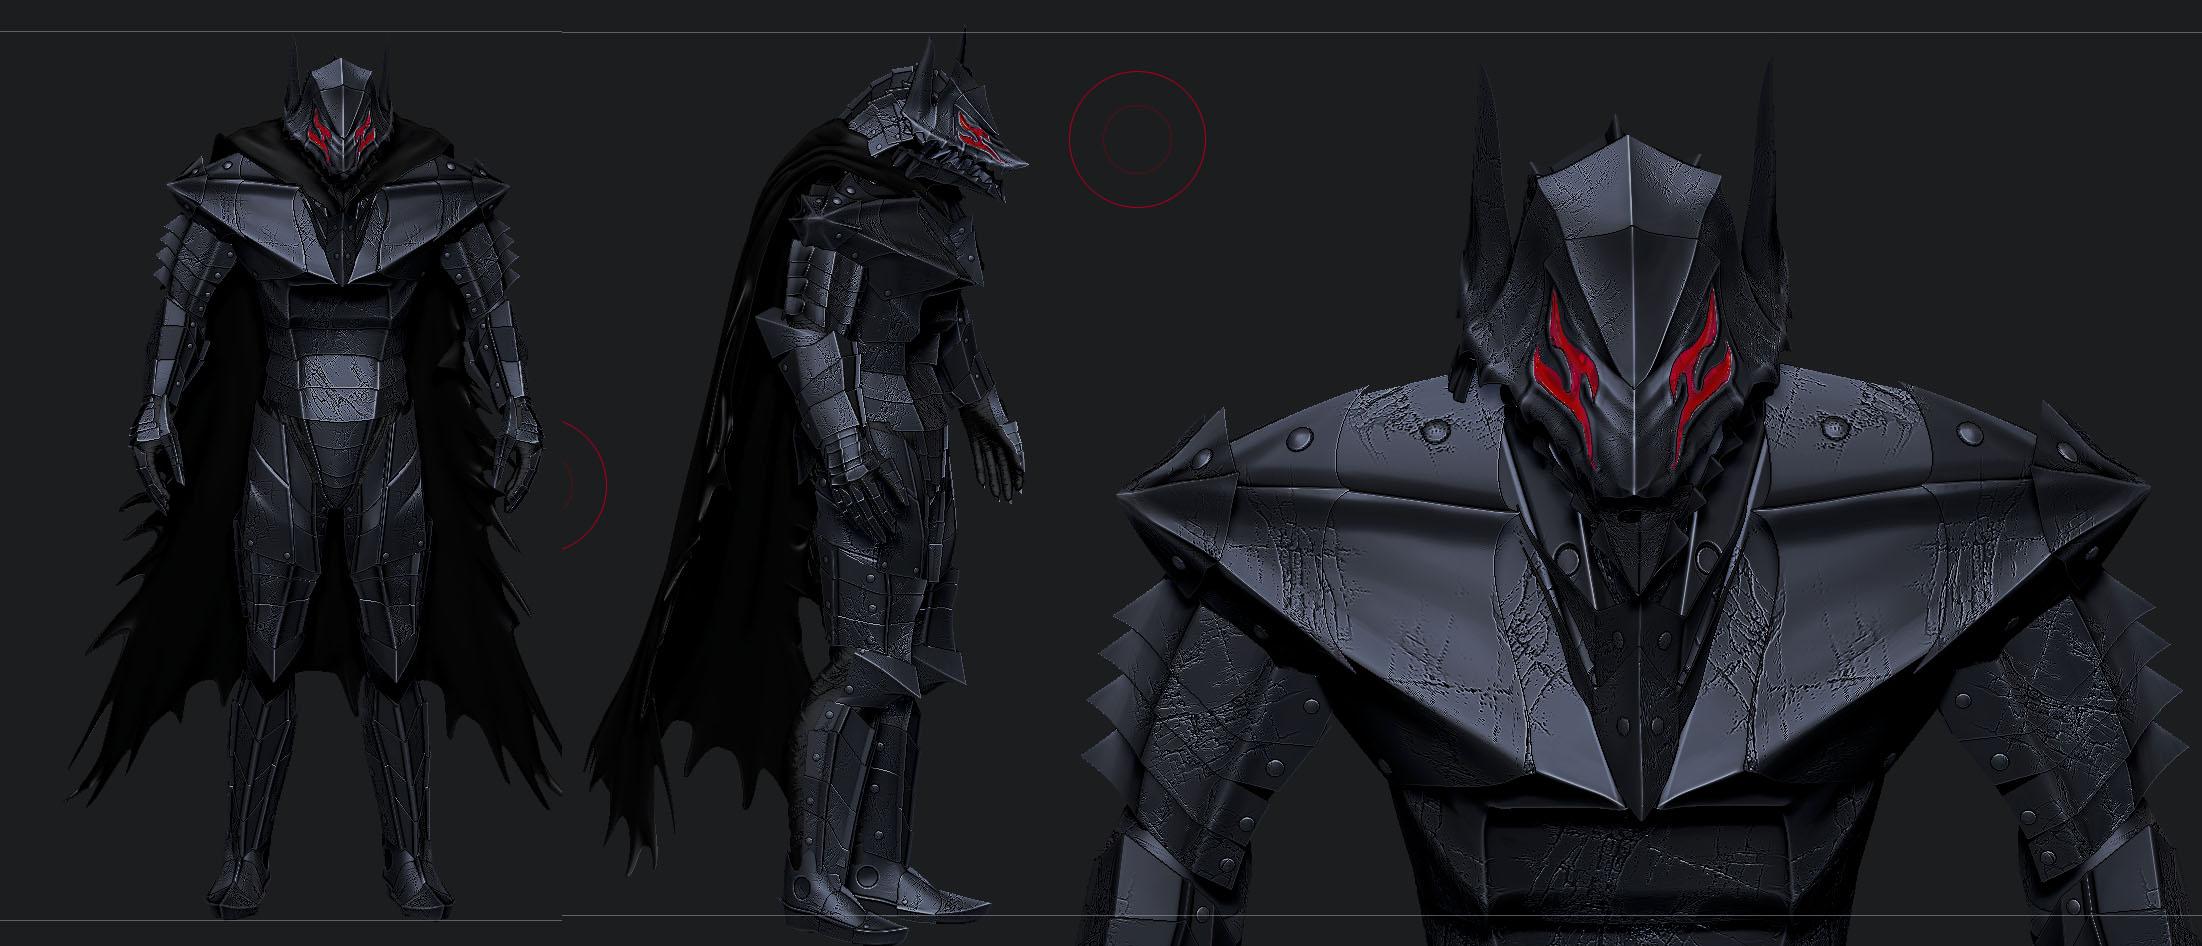 Medusa Armor Low Poly Render 2 at Skyrim Nexus - mods and